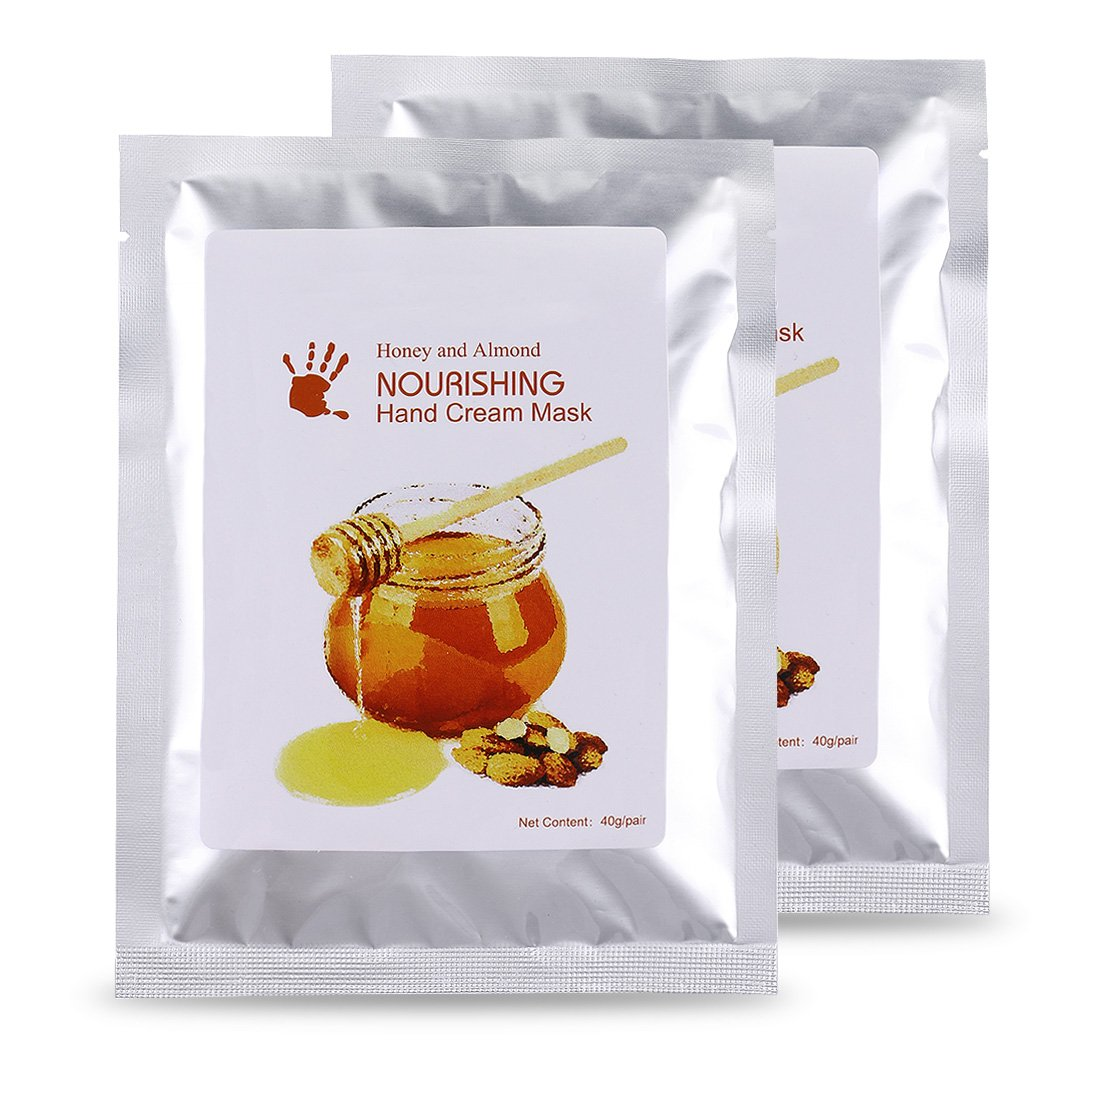 Hand Mask Glove Wokaar Honey & Mik Hand Mask Moisturizing Gloves for Dry Hand Exfoliating Nourishing Soothing Whitening,Peeling Mask 2 Pack (1 Pair/Pack)